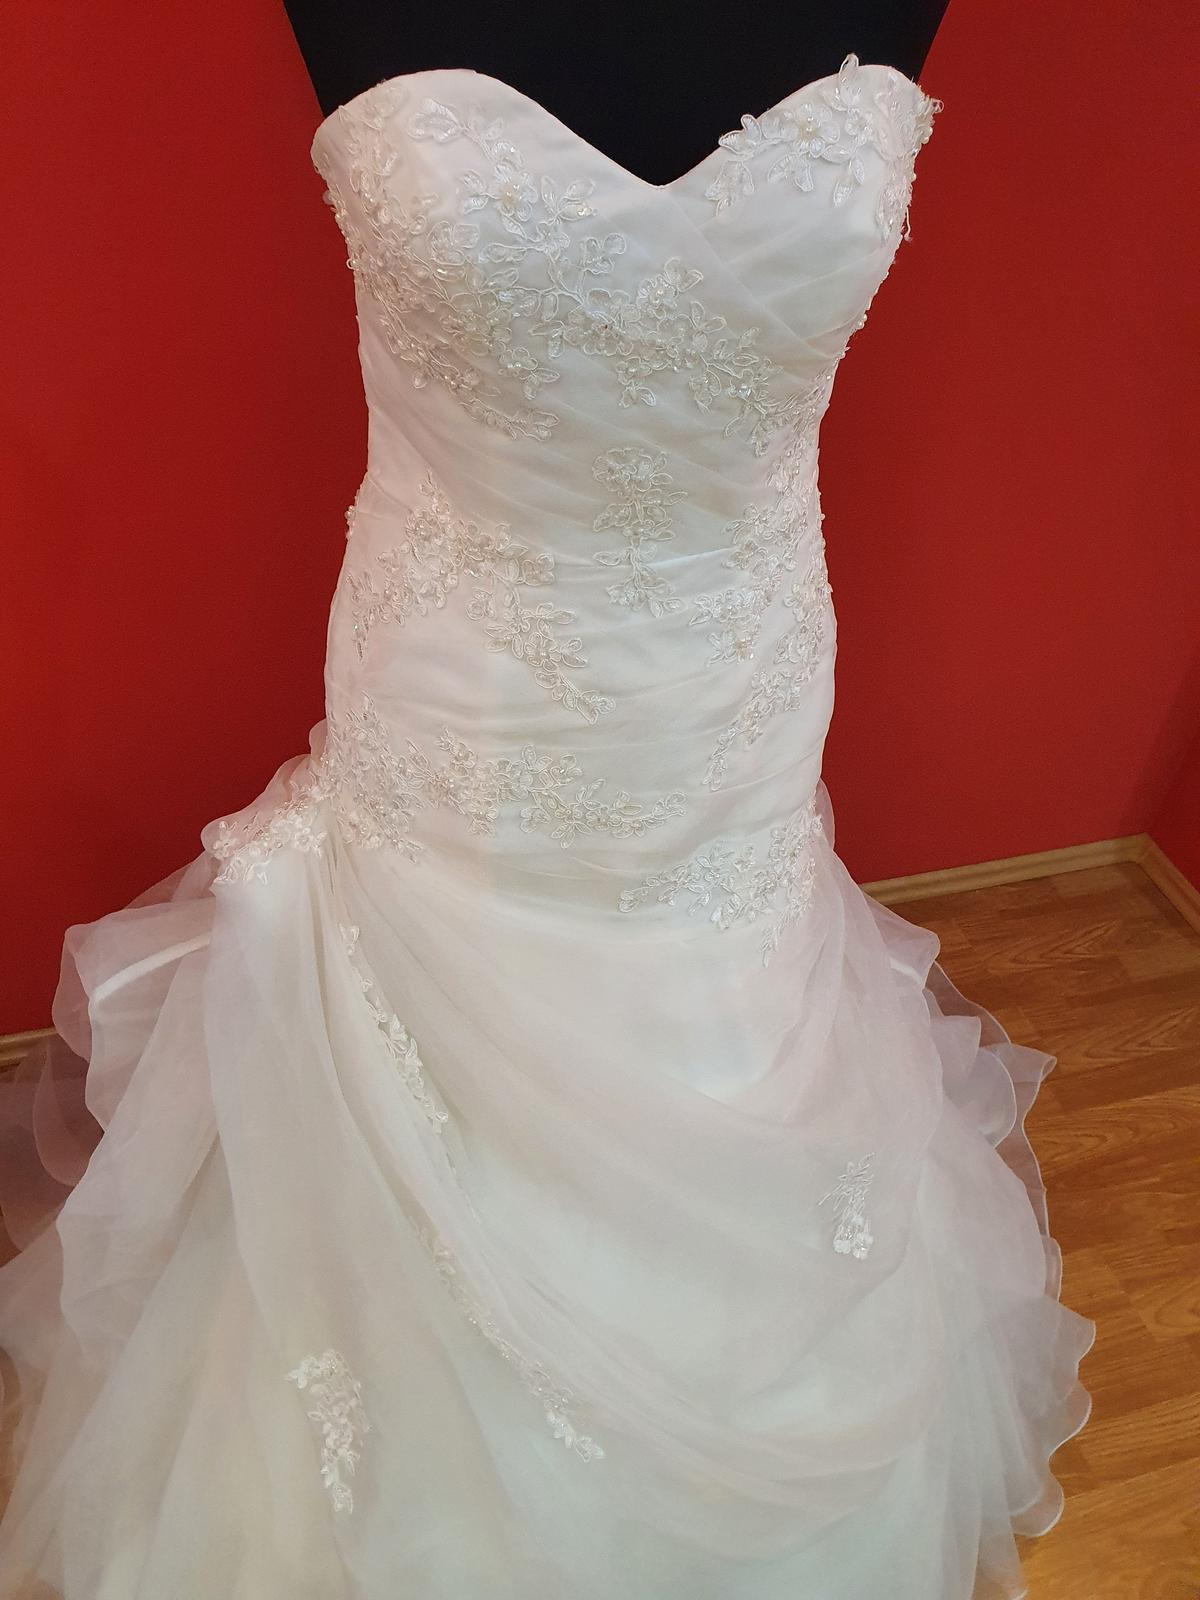 Svadobné šaty Nové - Obrázok č. 1